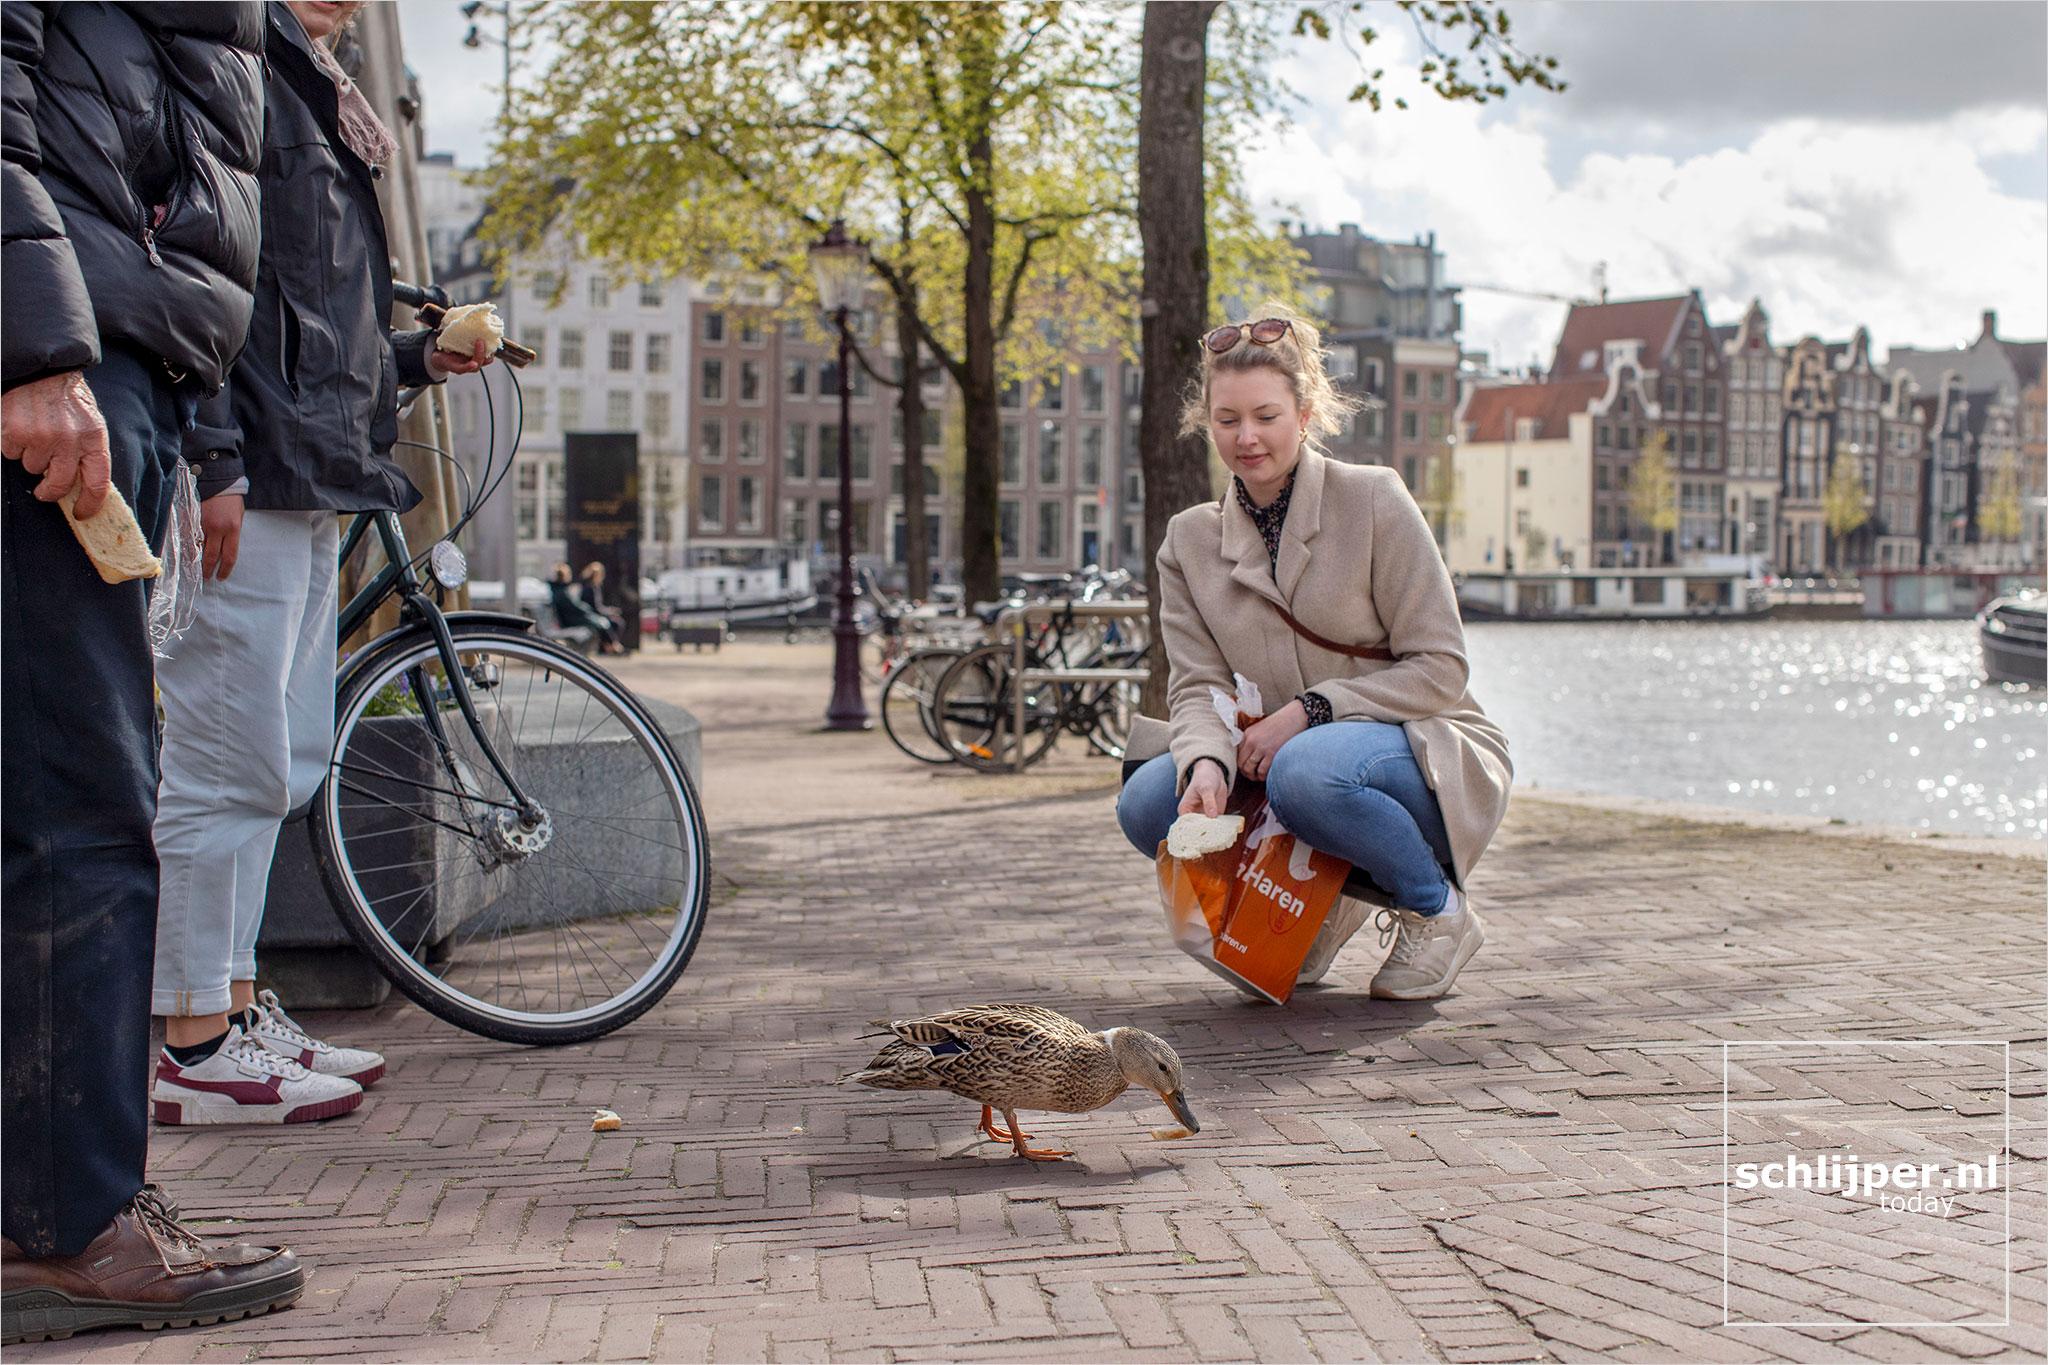 The Netherlands, Amsterdam, 5 mei 2021